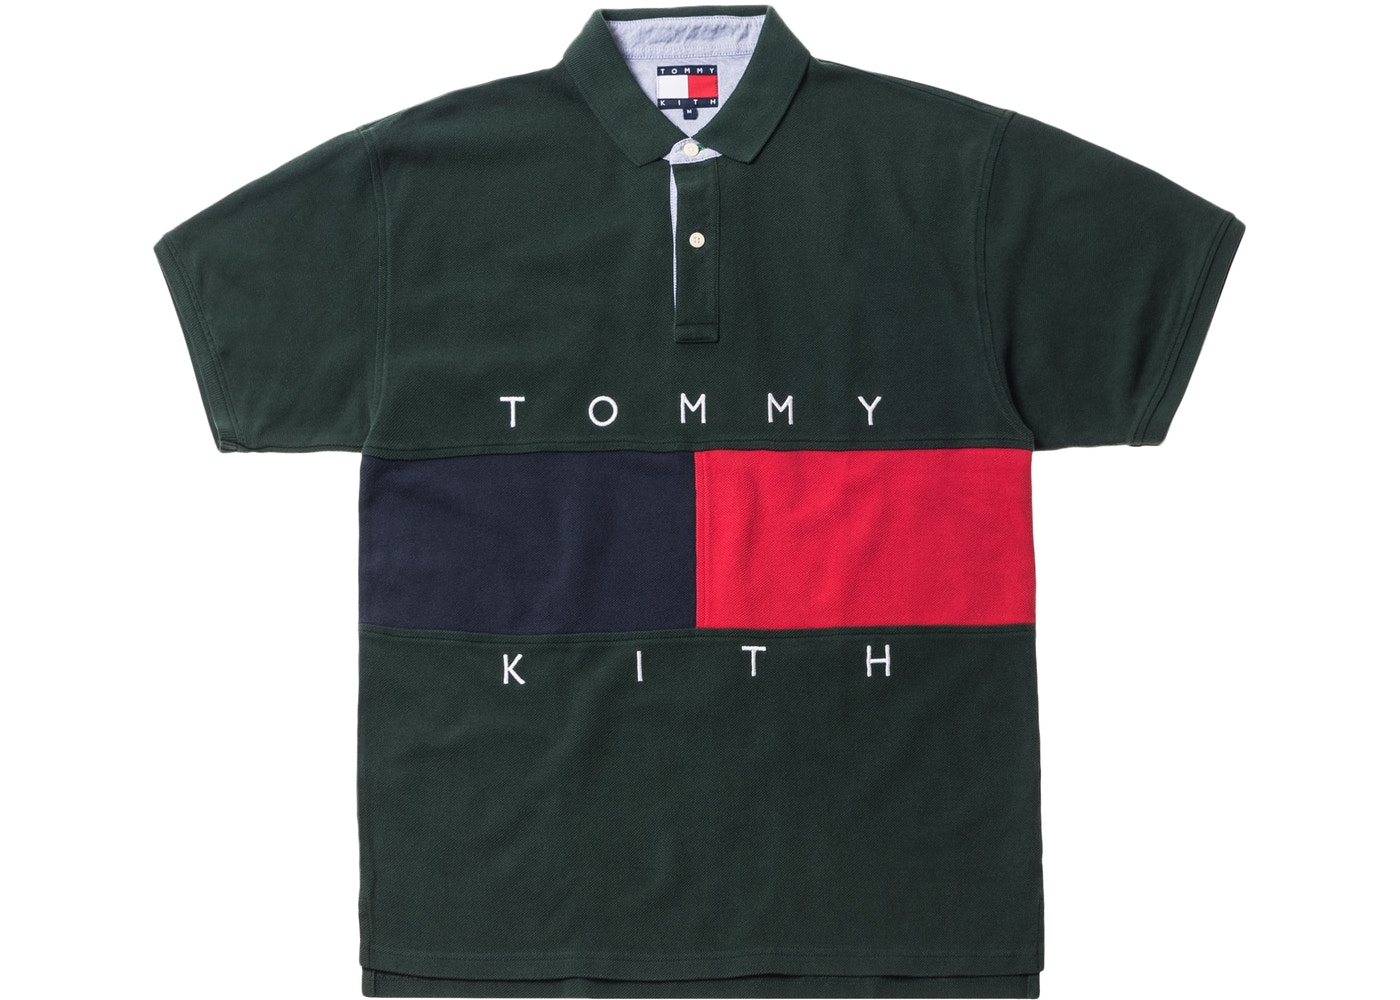 21dc6c02 Tommy Hilfiger Mens Graphic Print T Shirt